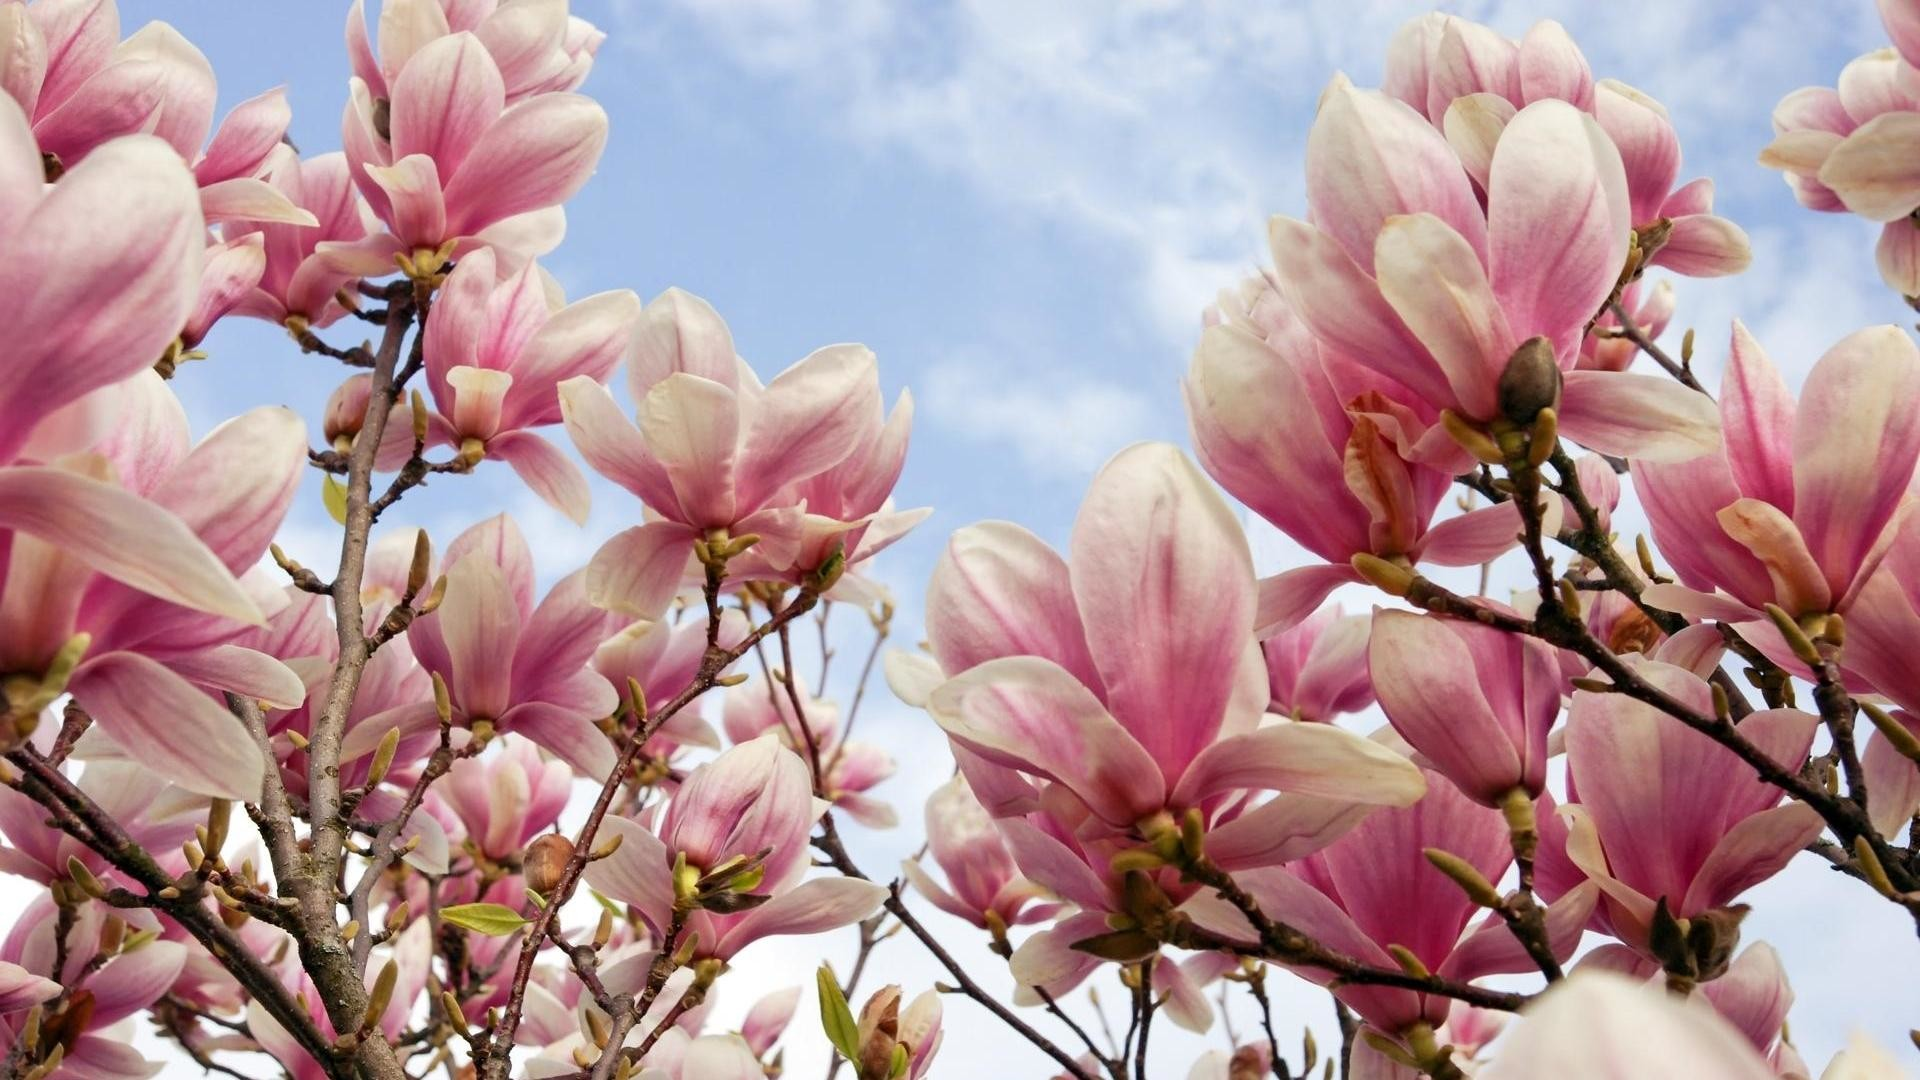 Magnolia wallpaper wallpapertag - Magnolia background ...